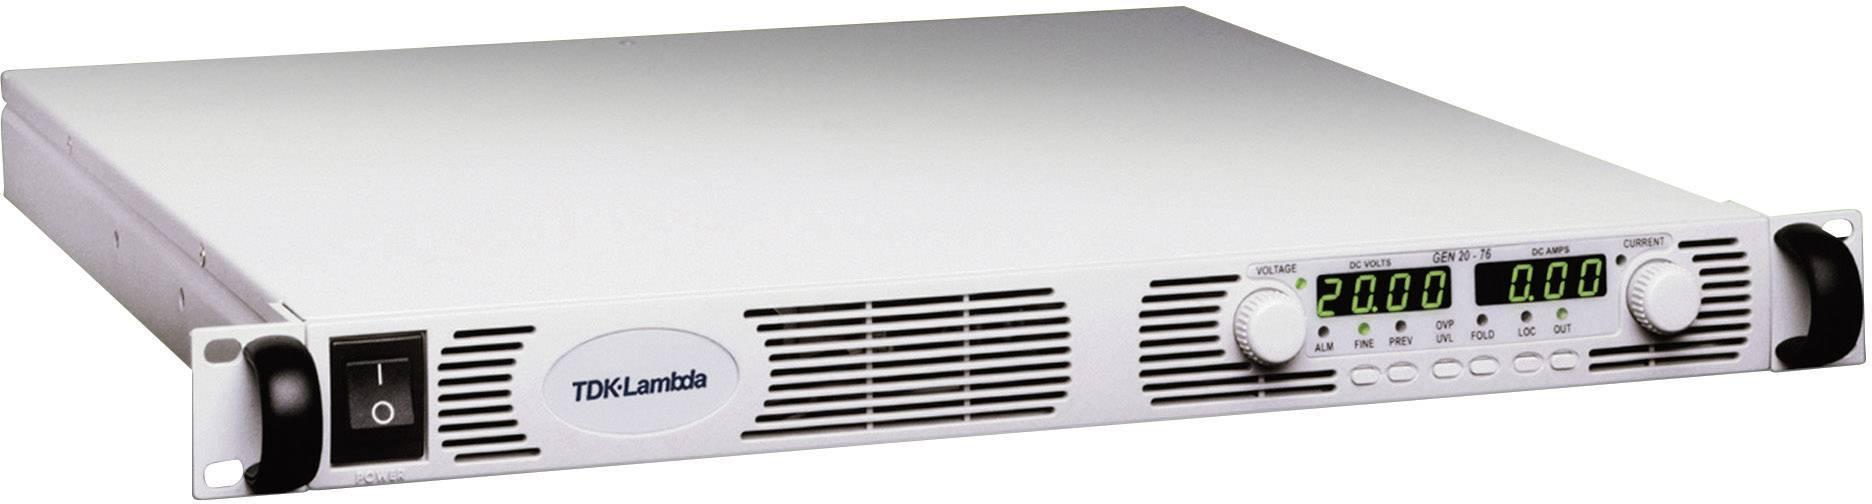 Laboratórny zdroj TDK-Lambda GEN-600-1.3, 0 - 600 V / DC, 0 - 1,3 A, 780 W